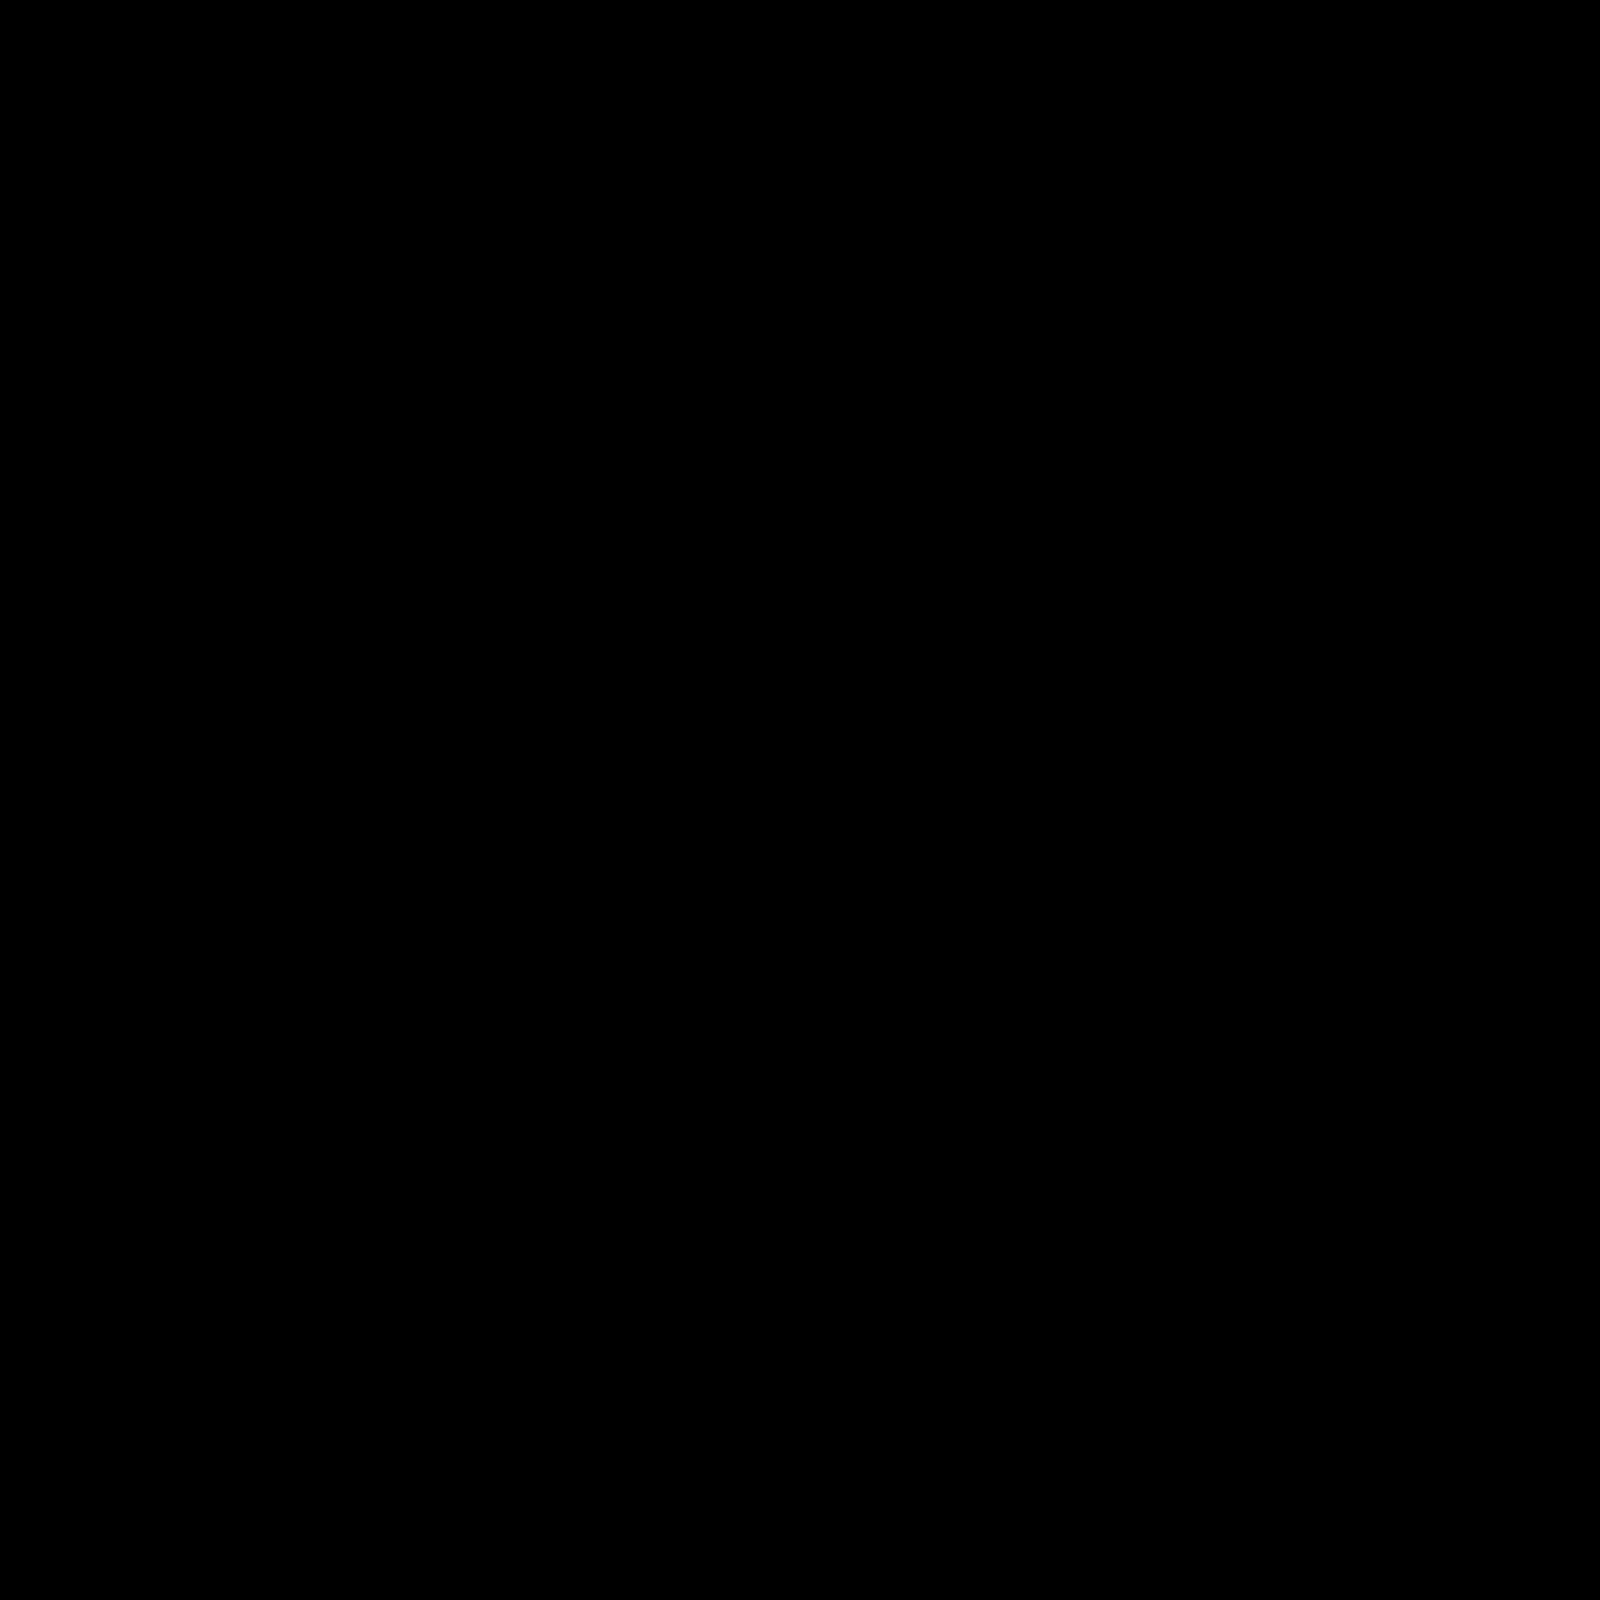 svg library Add company logo in. Vector append u2022 rh